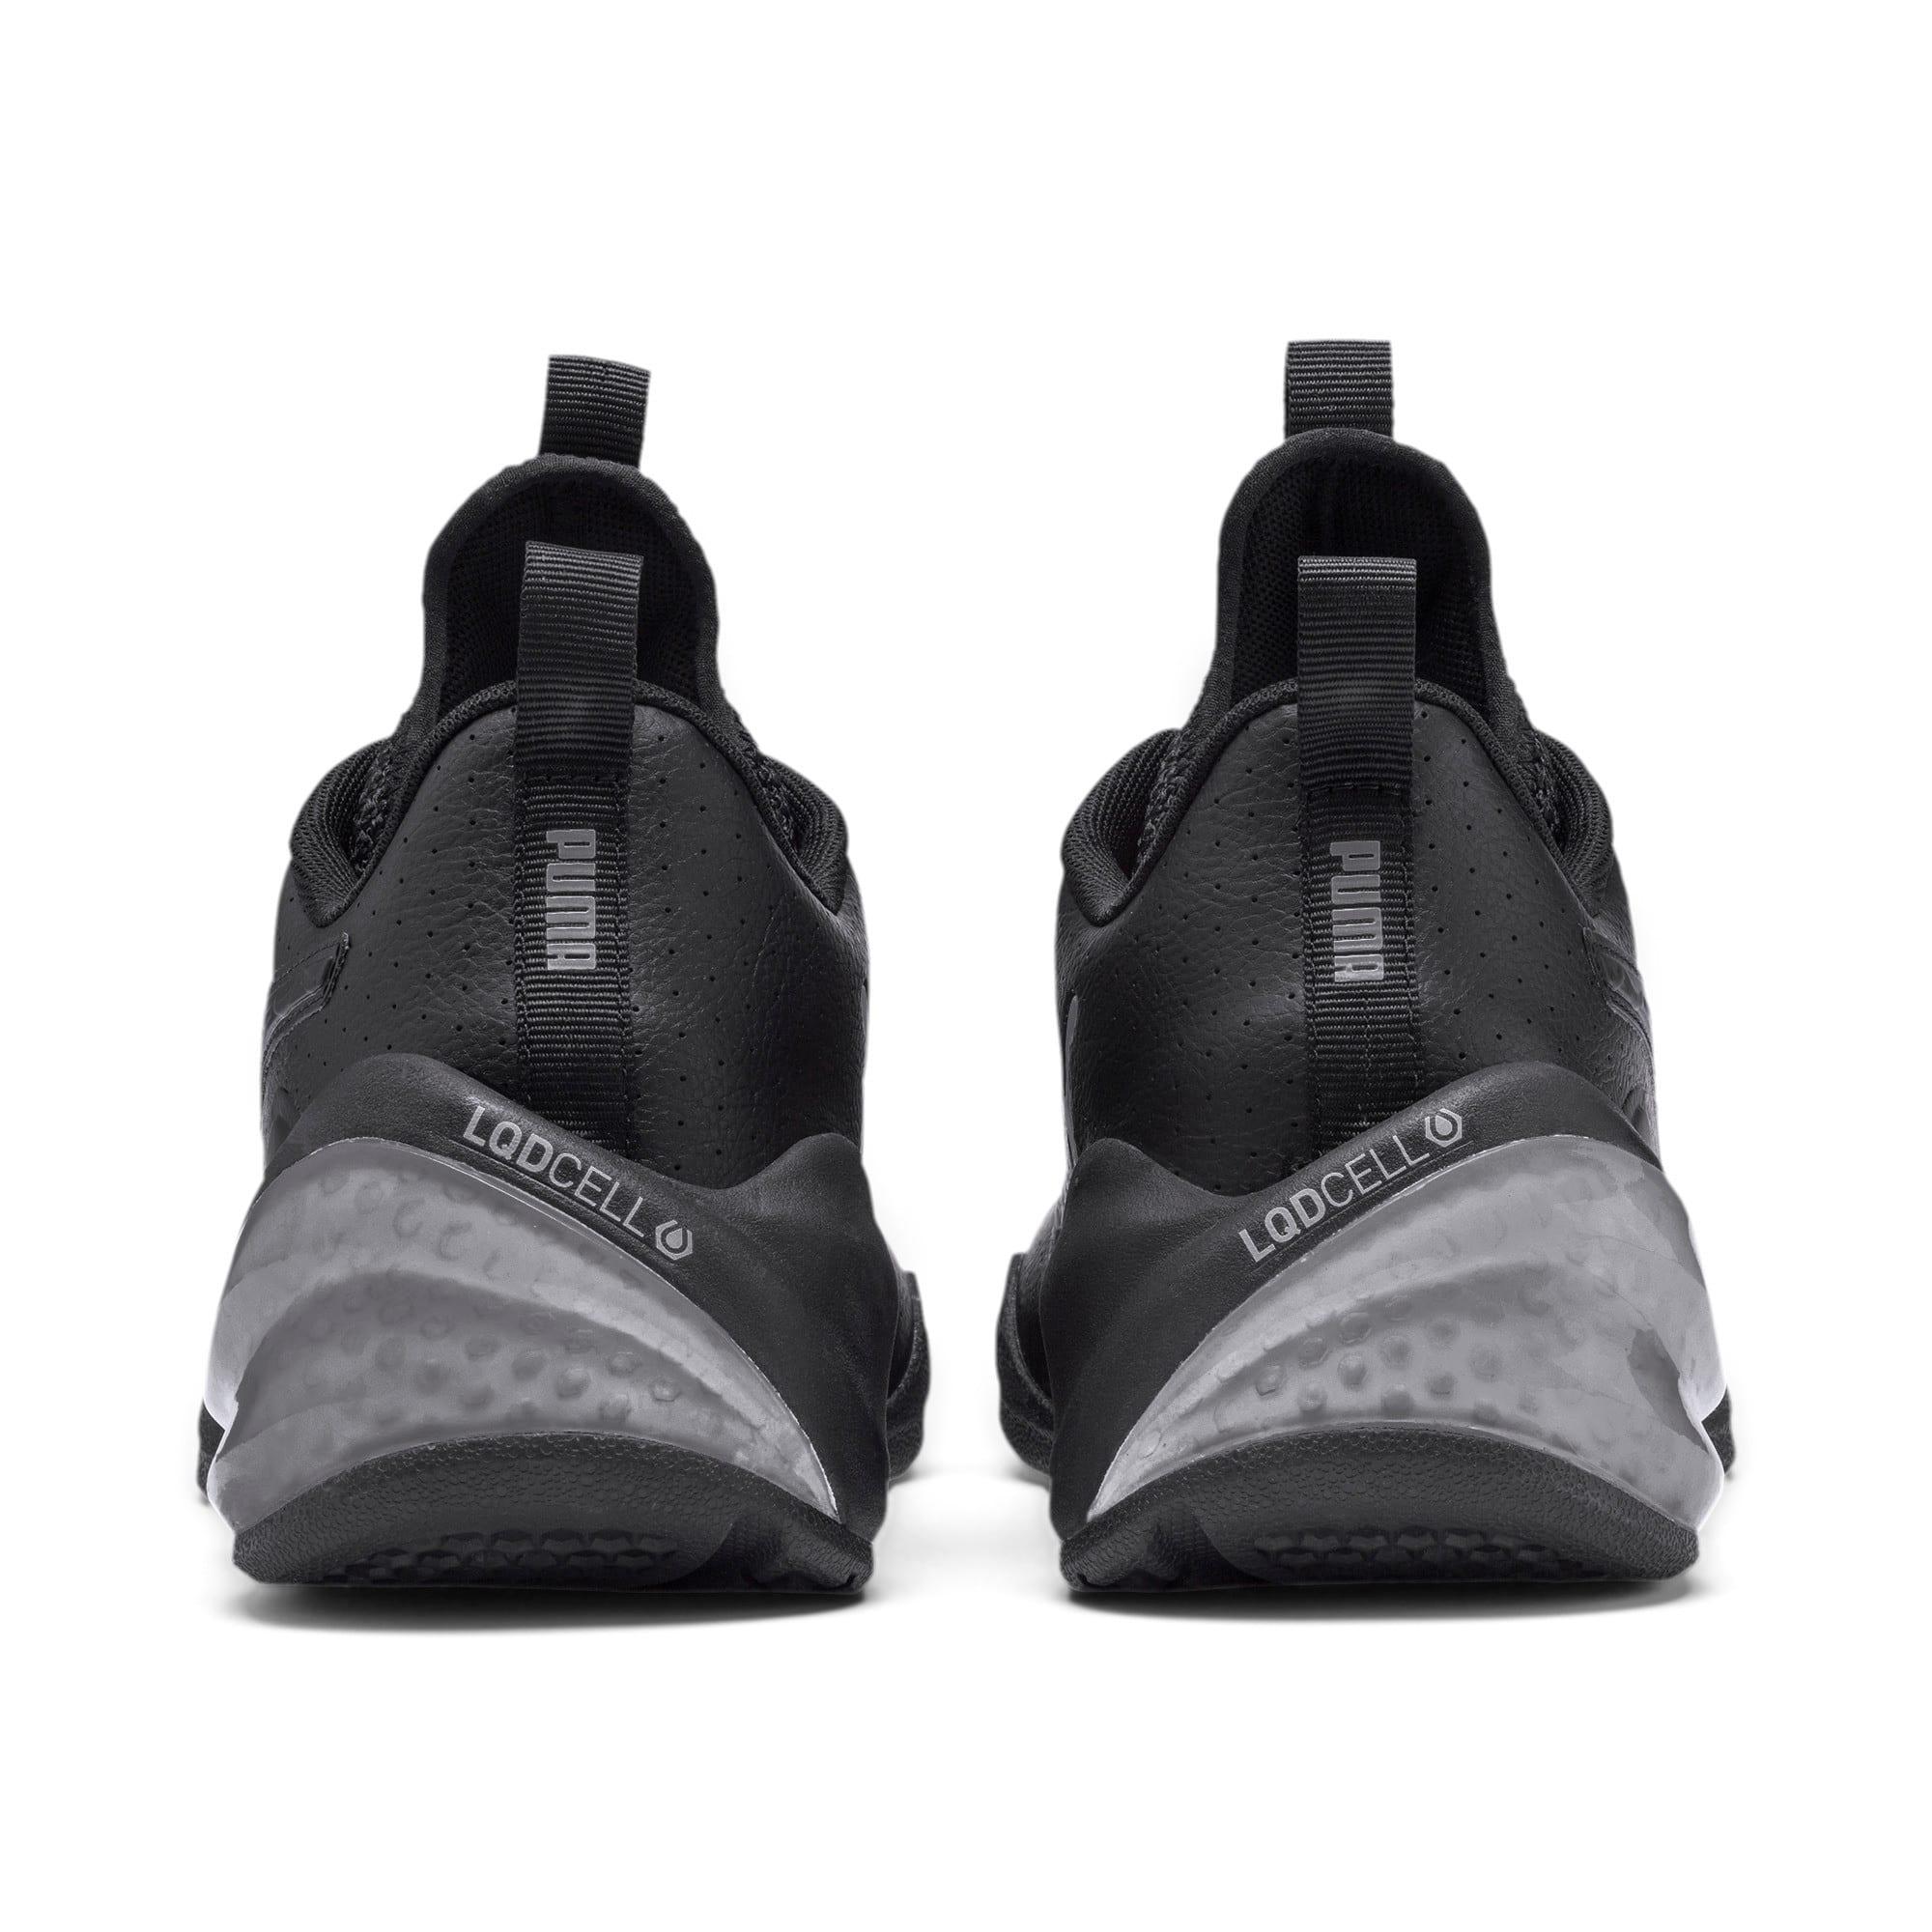 Thumbnail 4 of LQDCELL Challenge Perf Men's Training Shoes, Puma Black-CASTLEROCK, medium